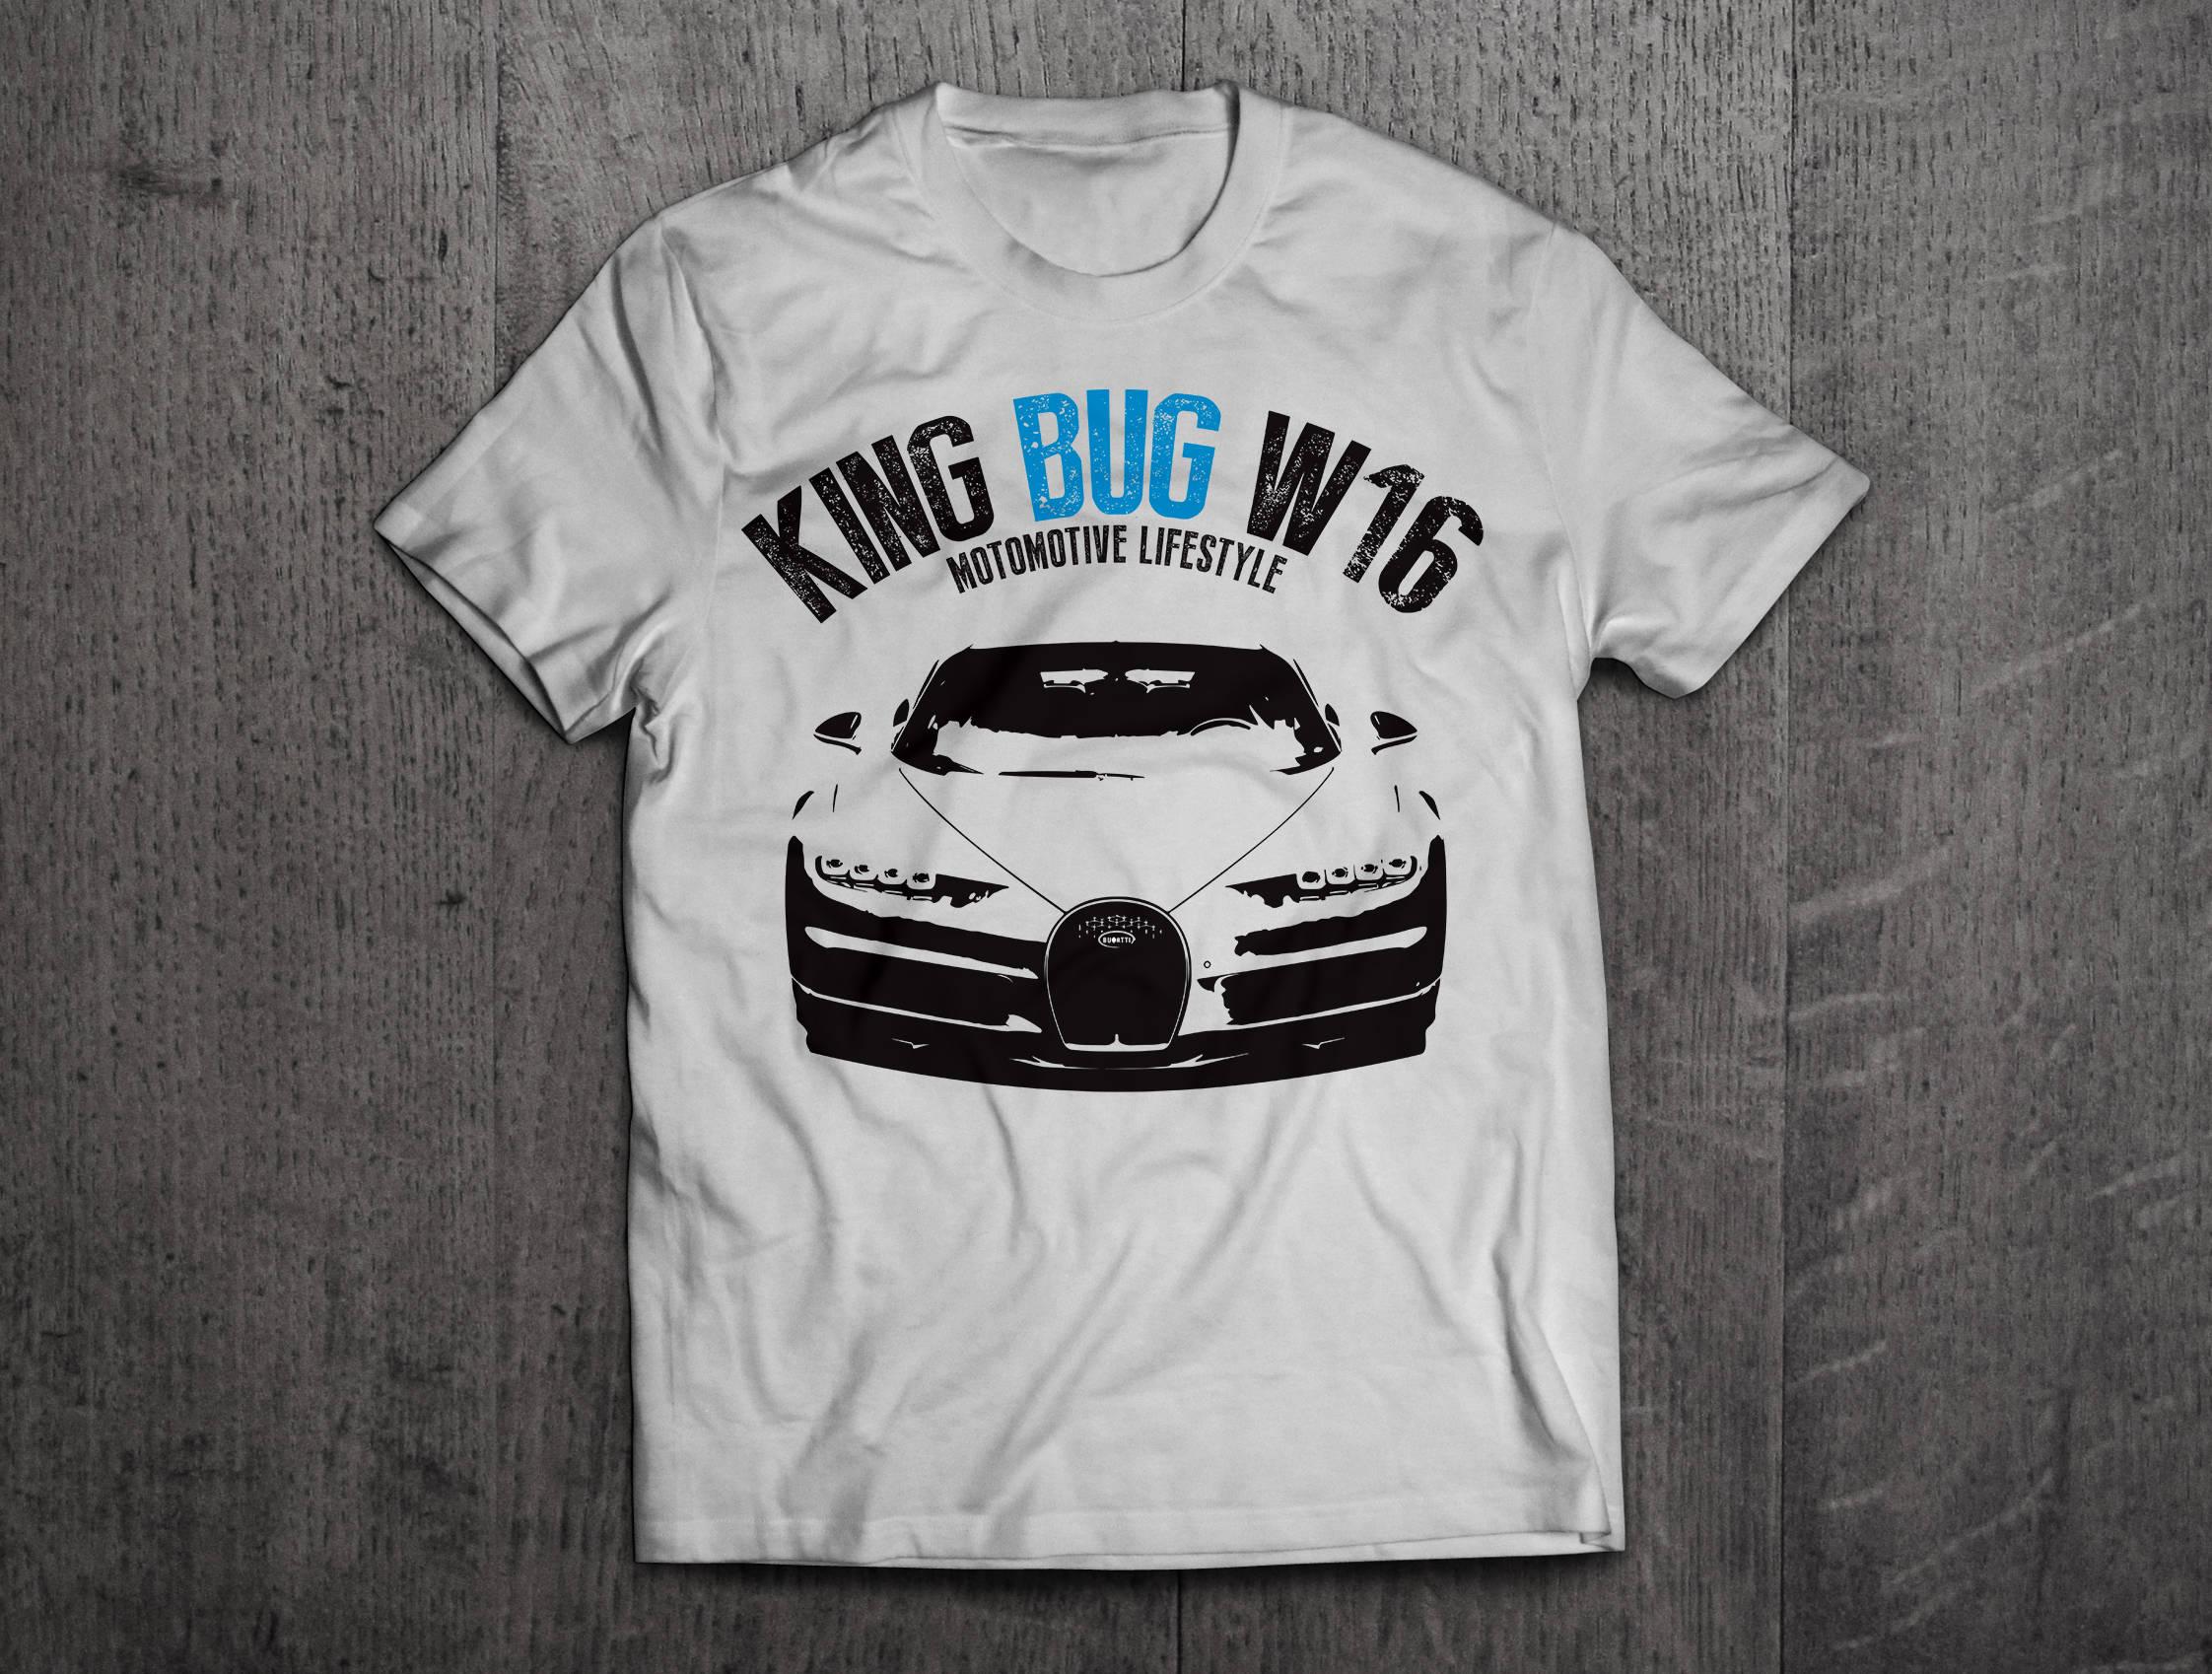 bugatti t shirt chiron shirts bugatti chiron shirts veyron. Black Bedroom Furniture Sets. Home Design Ideas